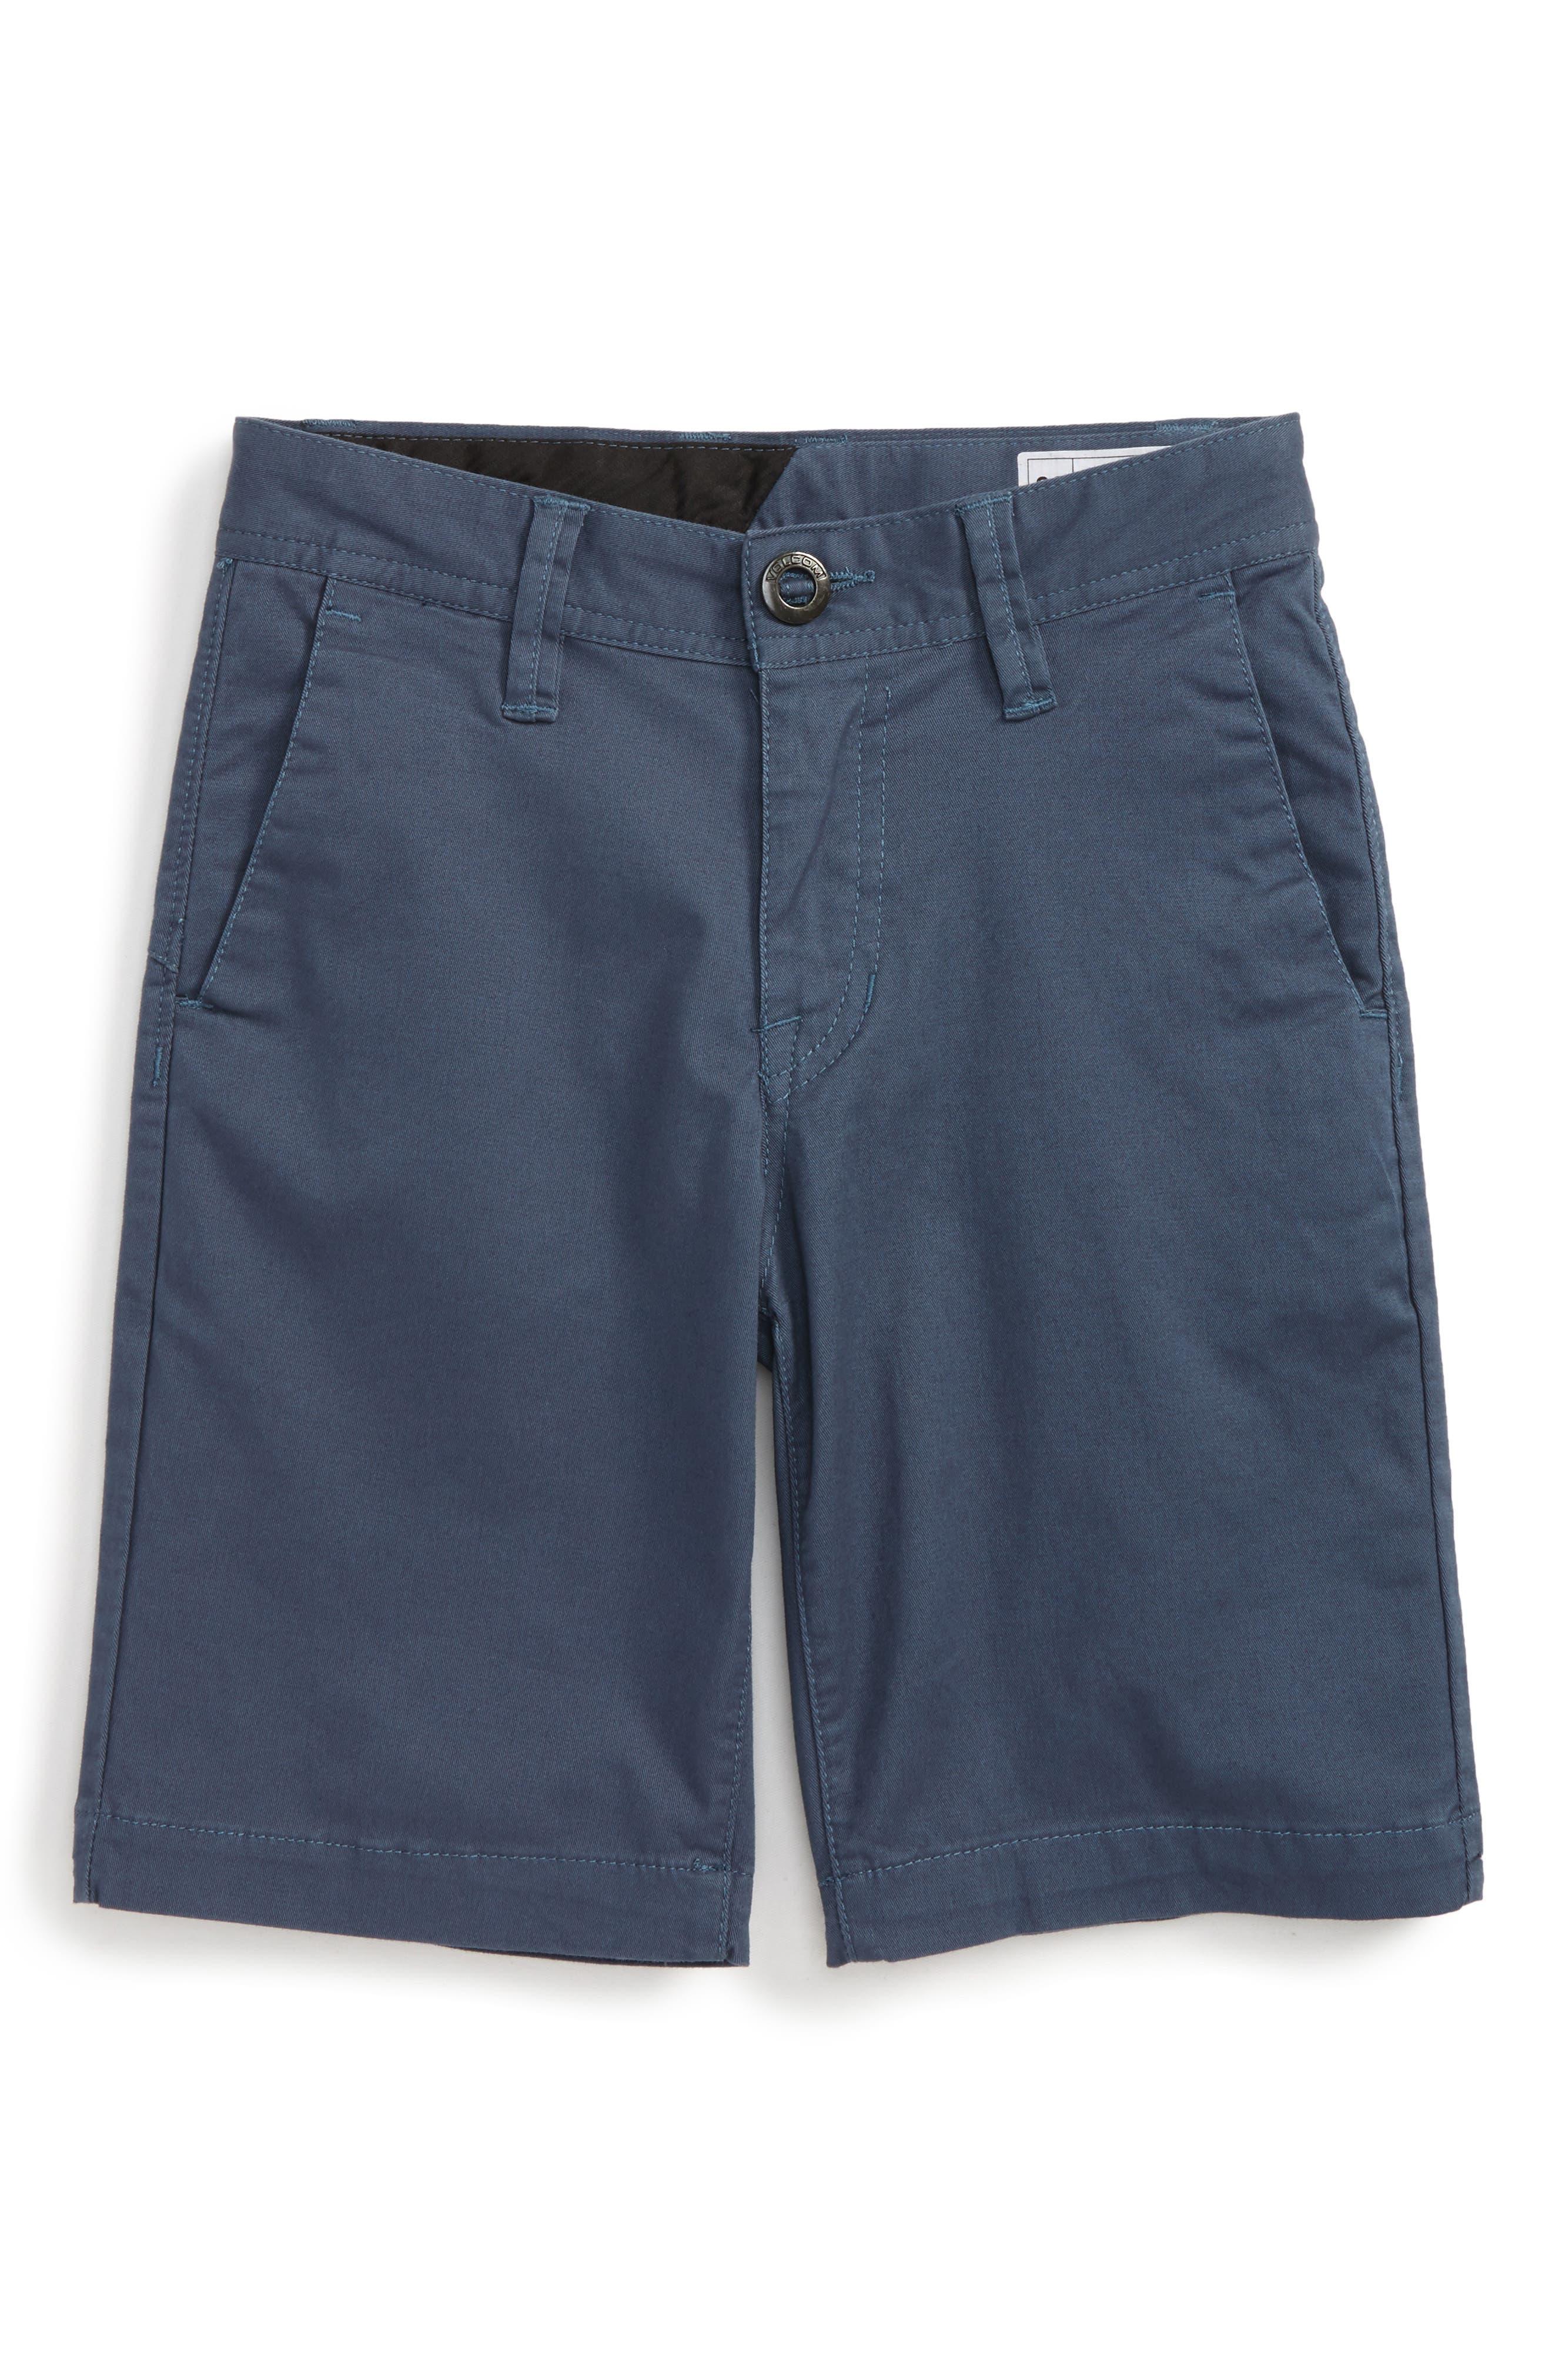 Cotton Twill Shorts,                         Main,                         color, Blue Air